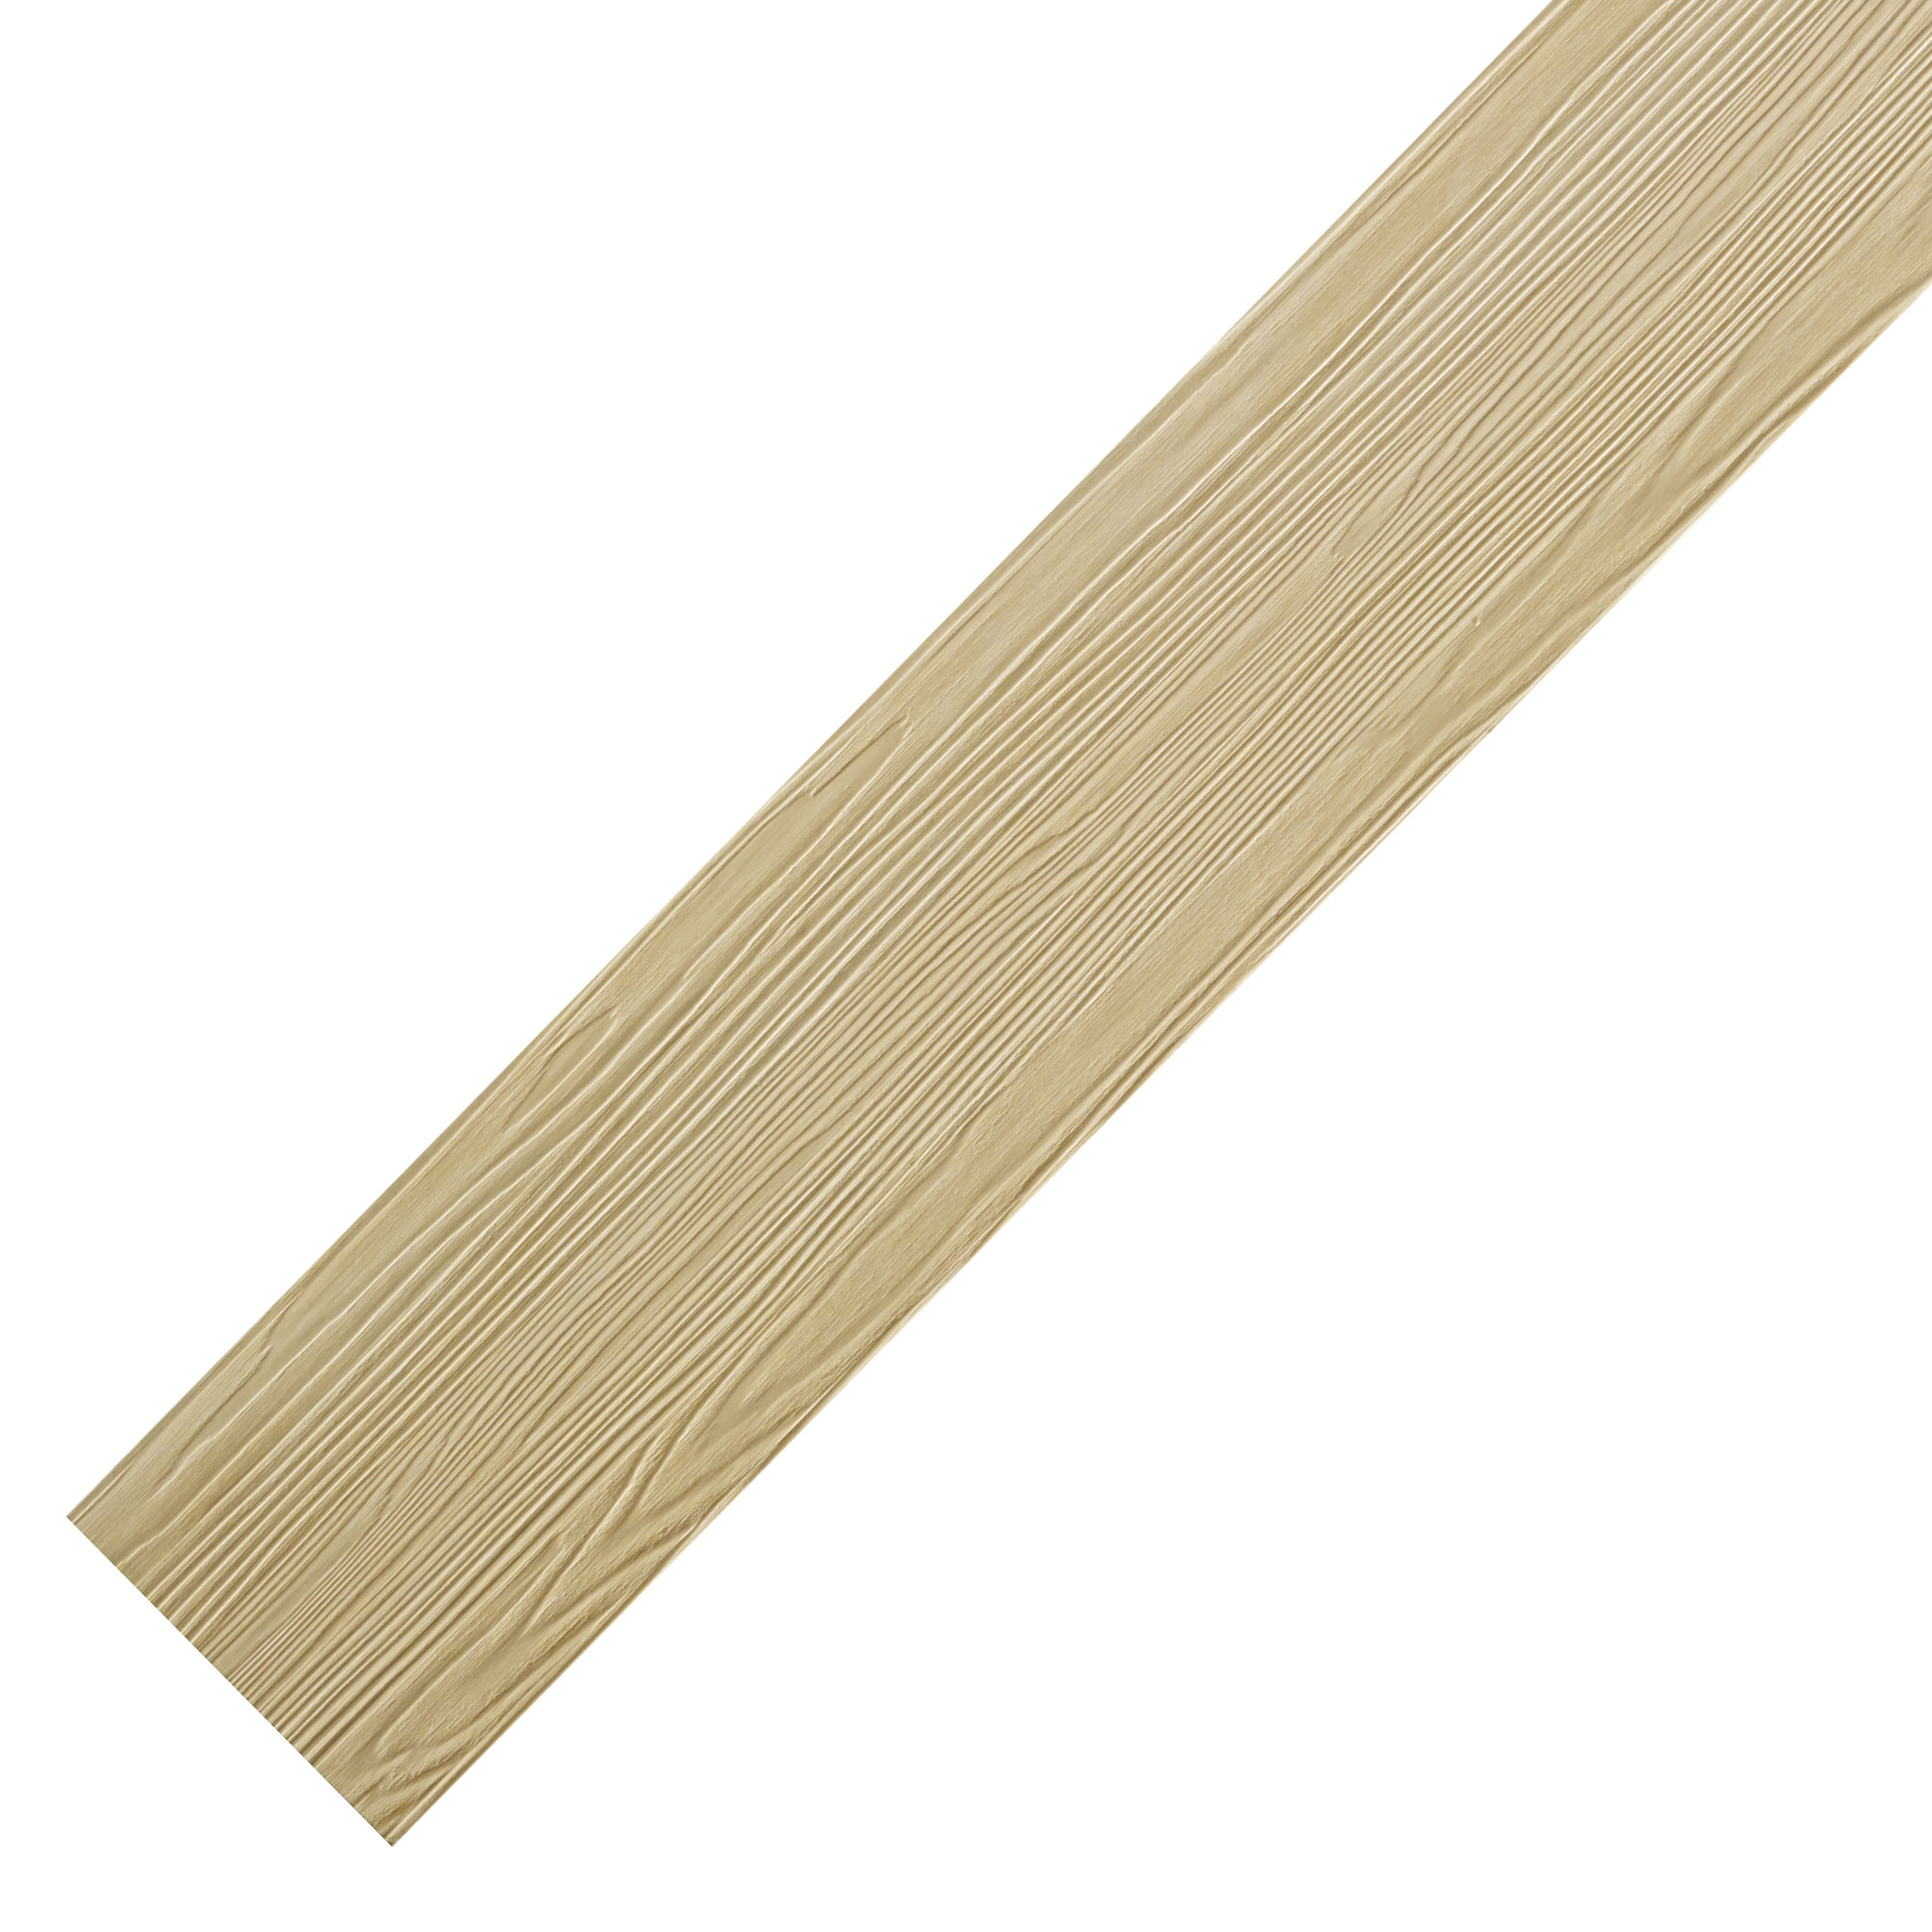 Wood approx 1 m vinyl laminate self adhesive textured for Laminato adesivo